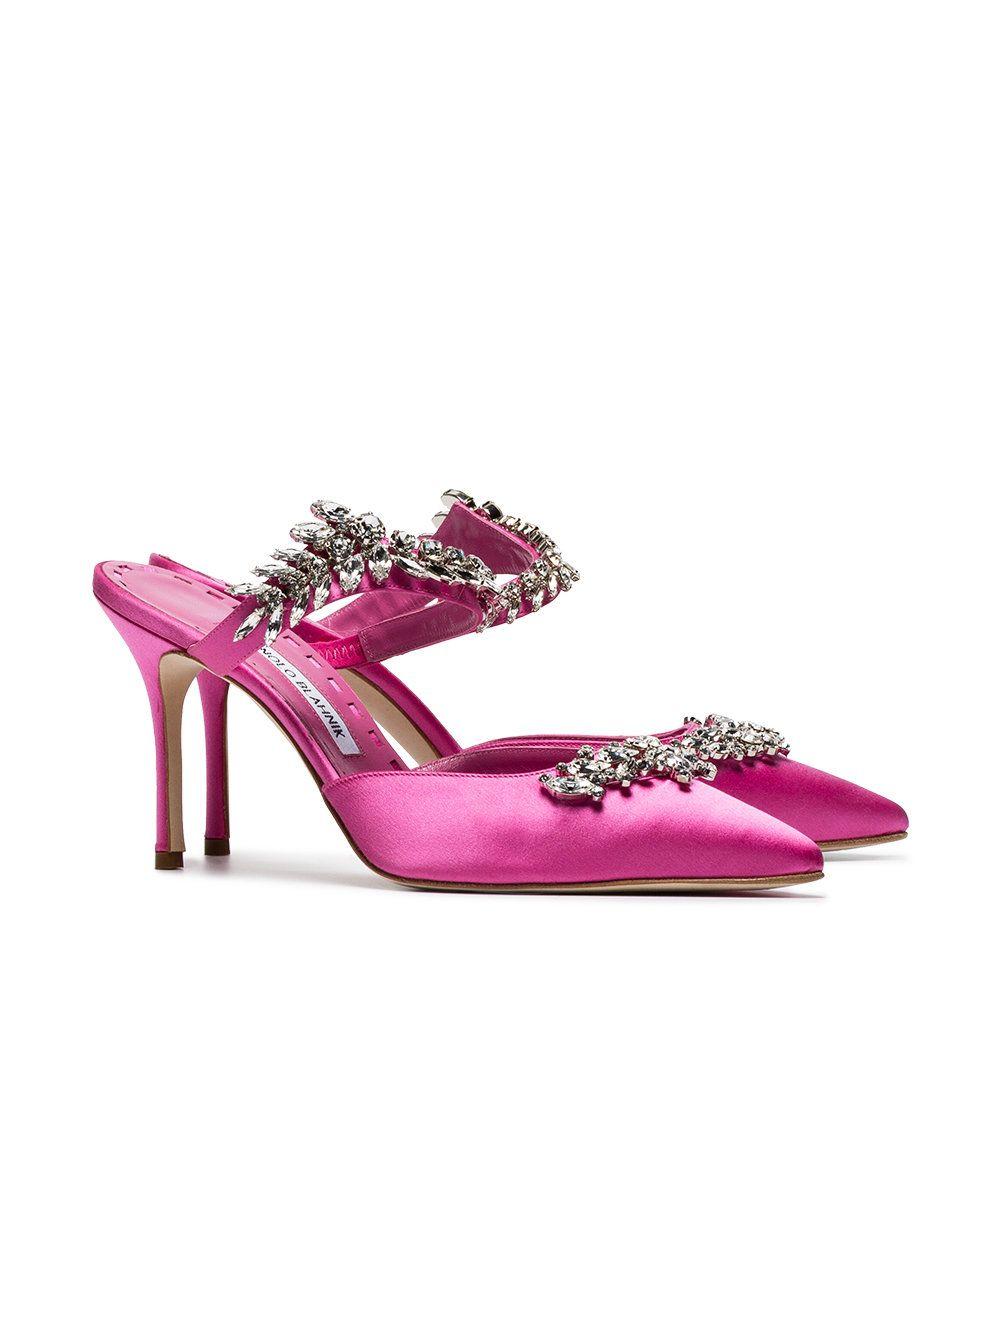 0e56bb3f2956 Manolo Blahnik Shoes · Pink Satin · Pink Shoes · https   www.farfetch.com in  shopping women